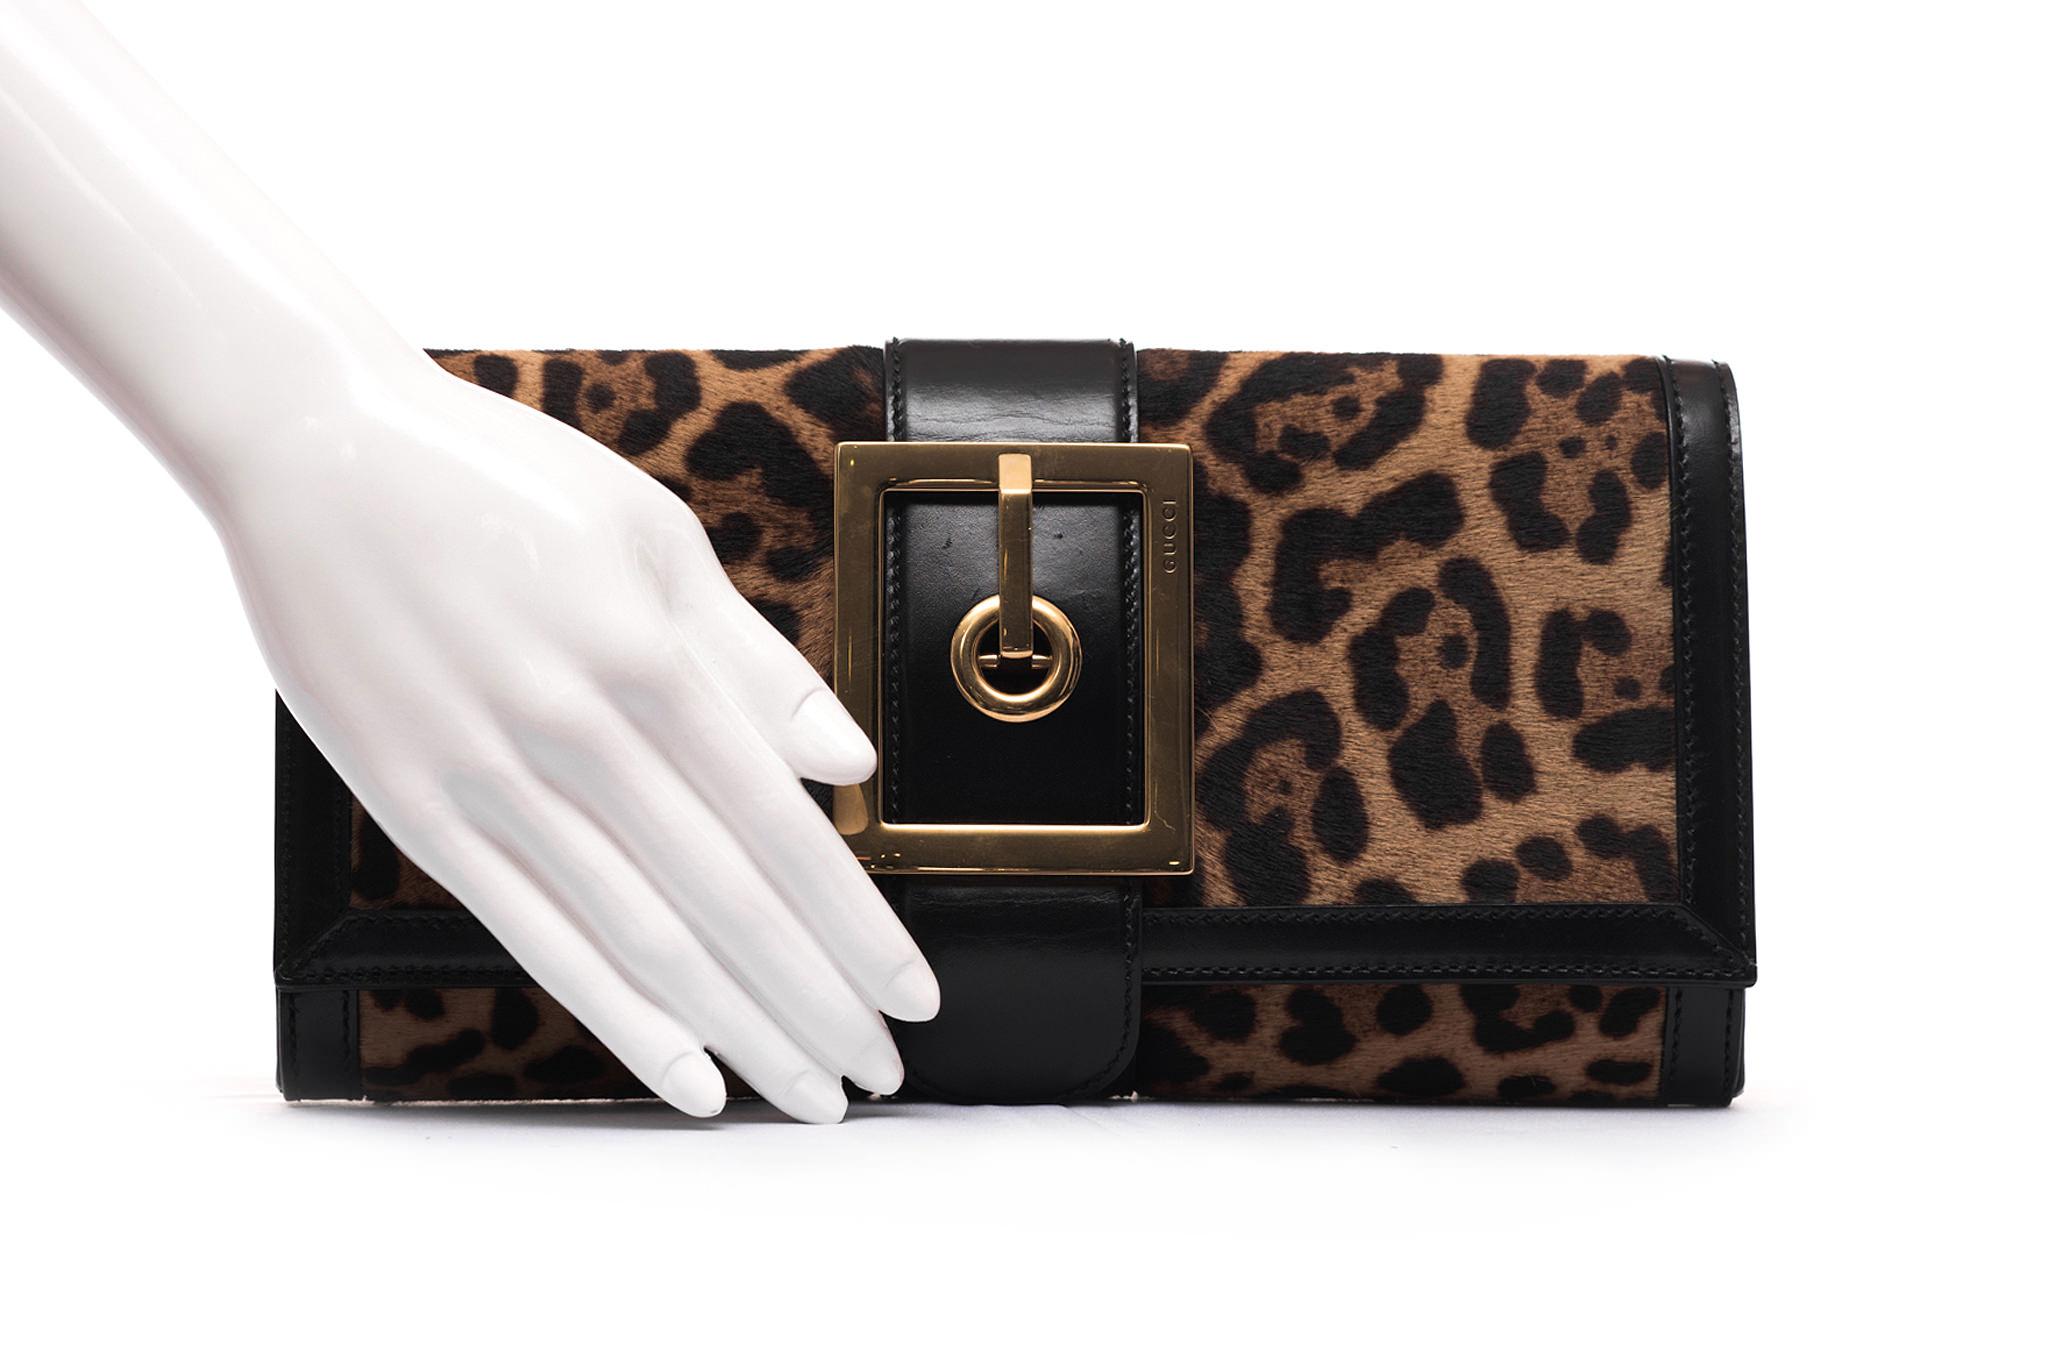 e4ec90038 Clutch Gucci Lady Buckle | Box de Grife